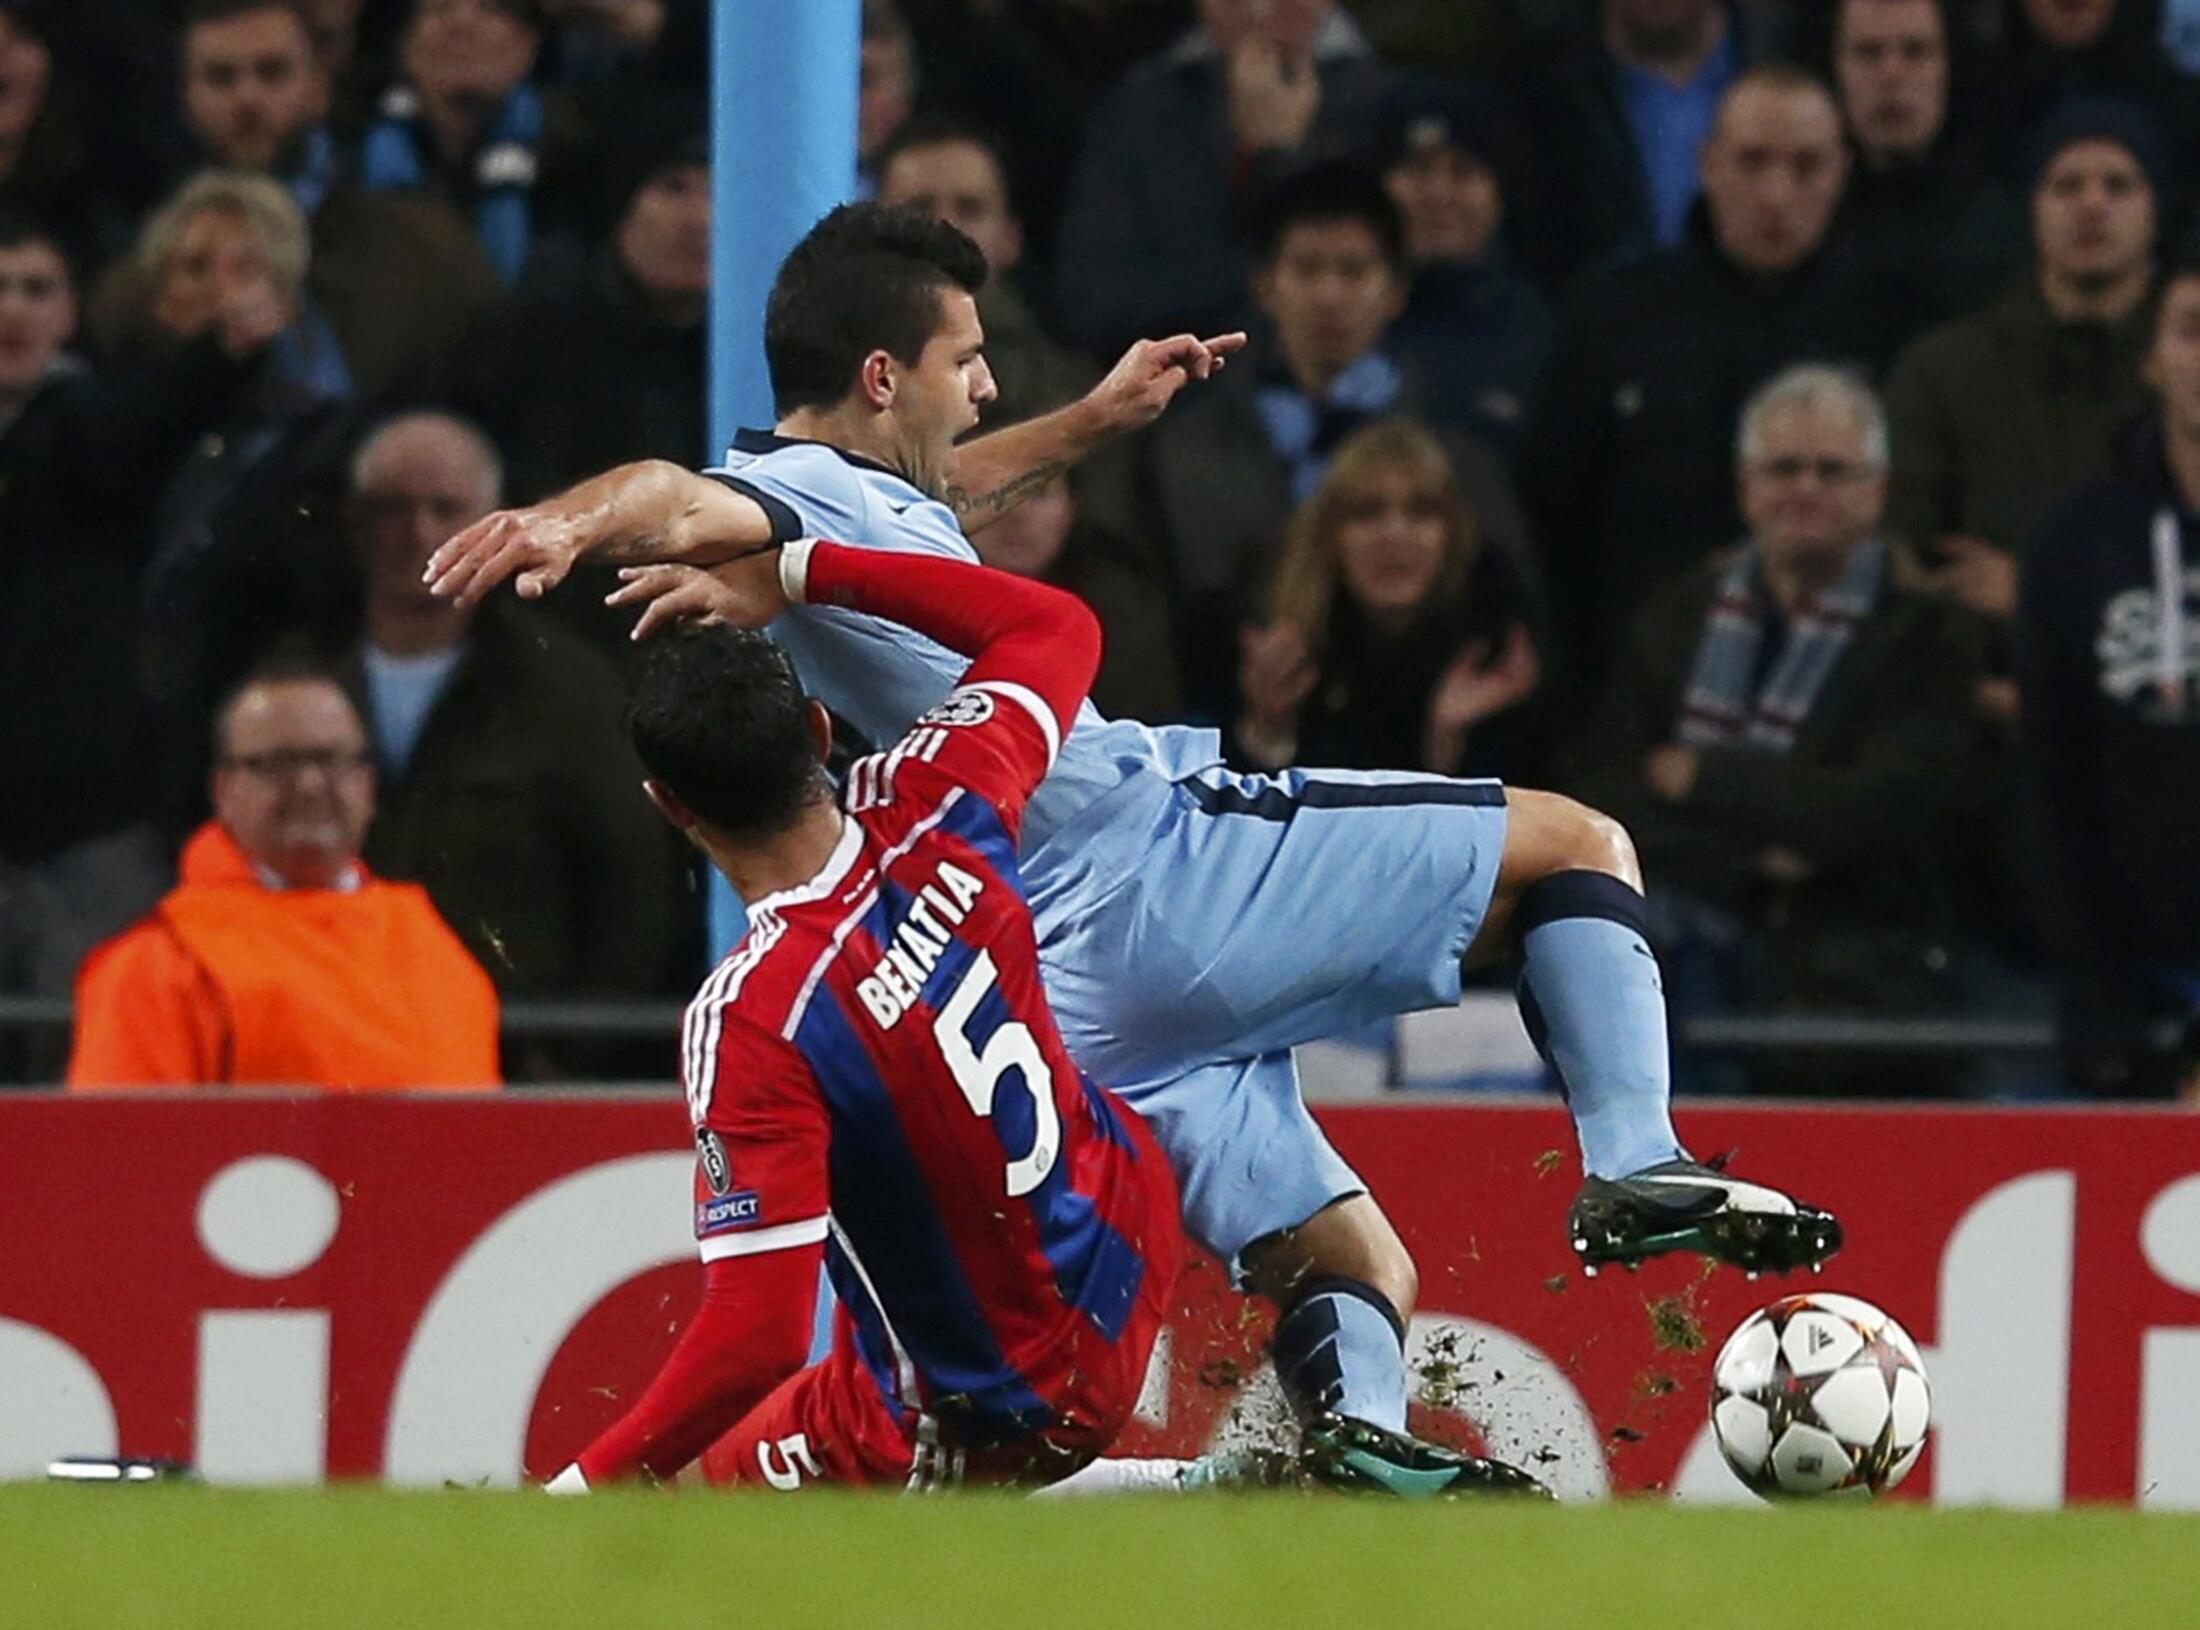 La faute indiscutable du Munichois Mehdi Benatia sur Sergio Agüero.